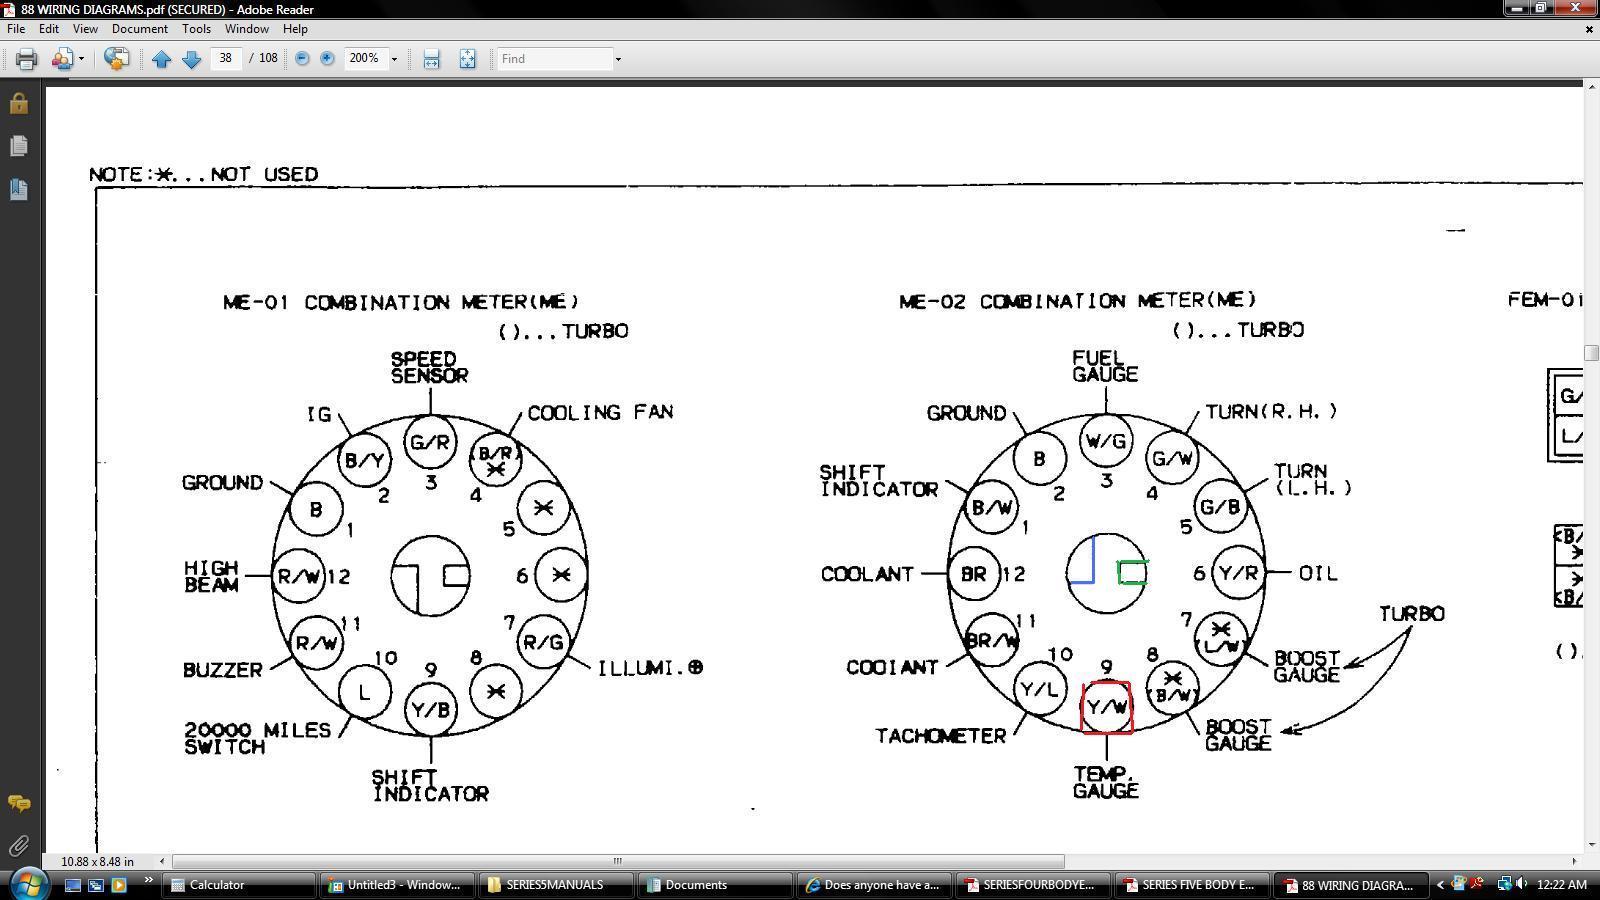 vdo water temp gauge wiring diagram samsung home theatre sunpro 32